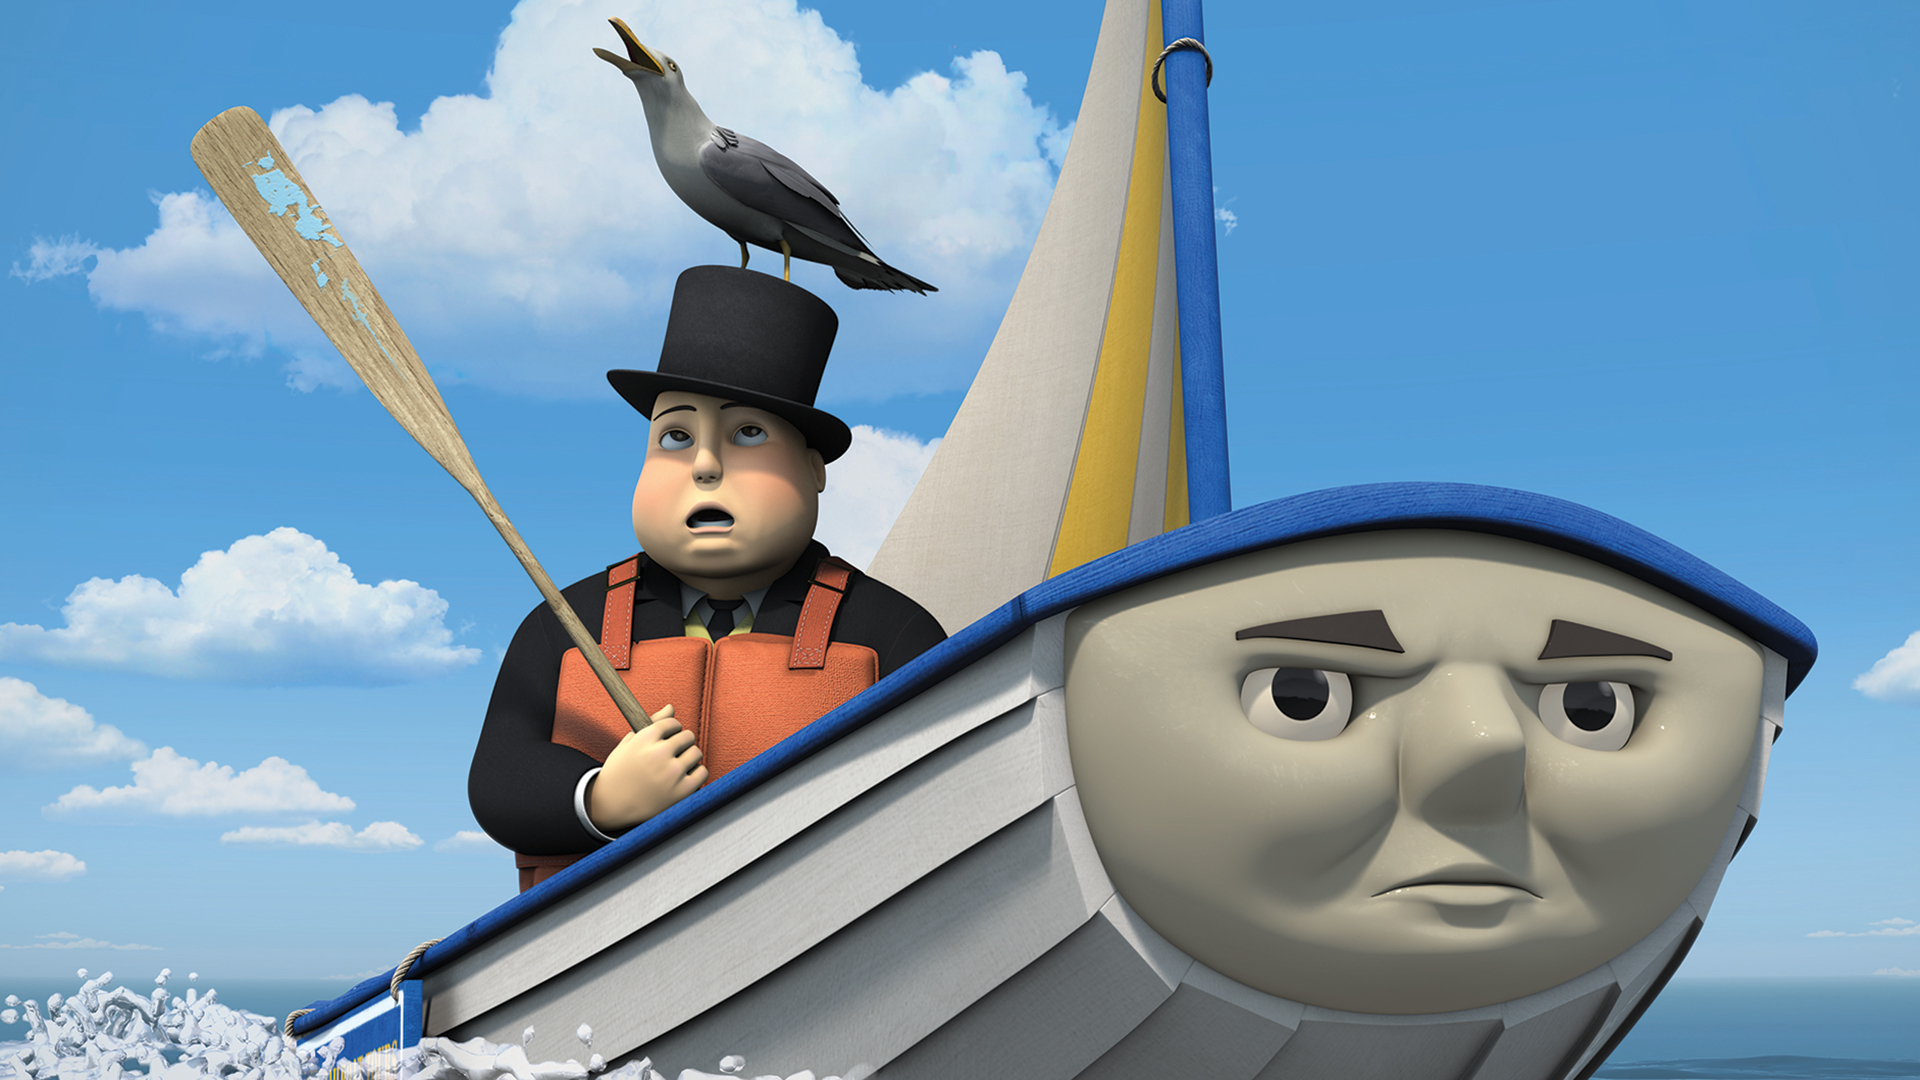 Thomas And Friends Skiff The Railboat